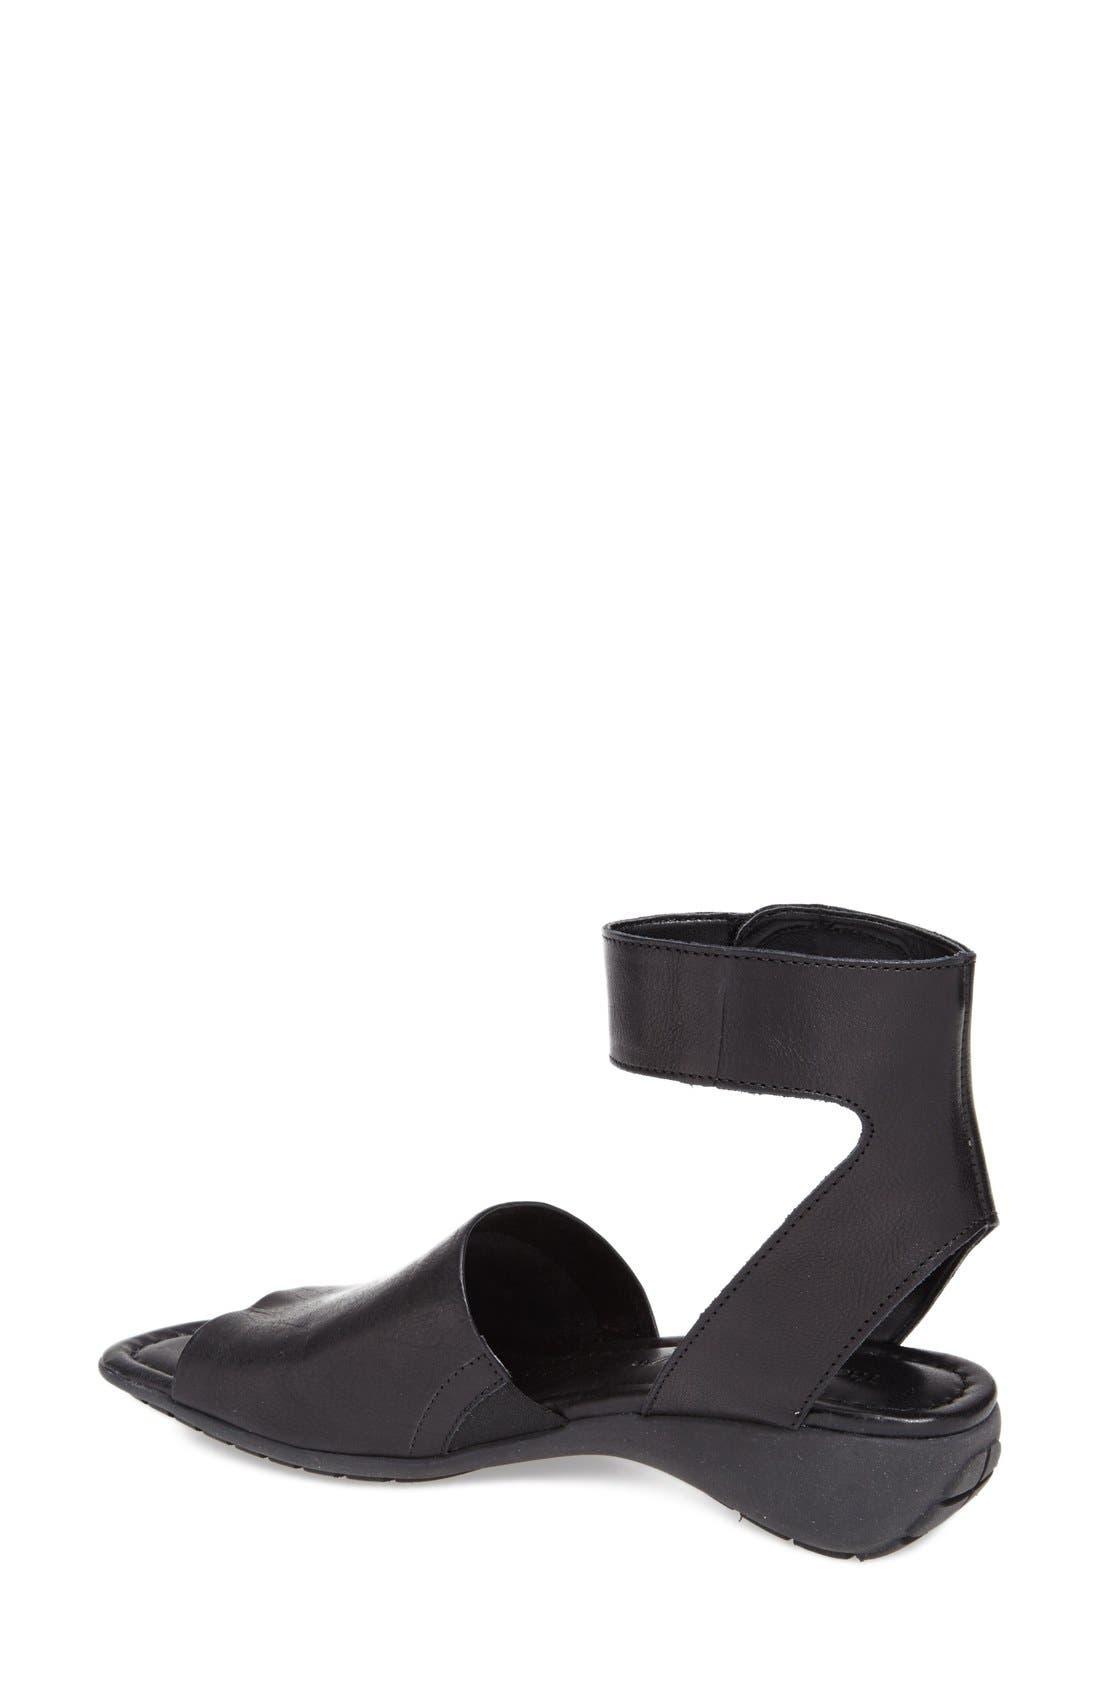 Alternate Image 2  - The FLEXX 'Beglad' Leather Ankle Strap Sandal